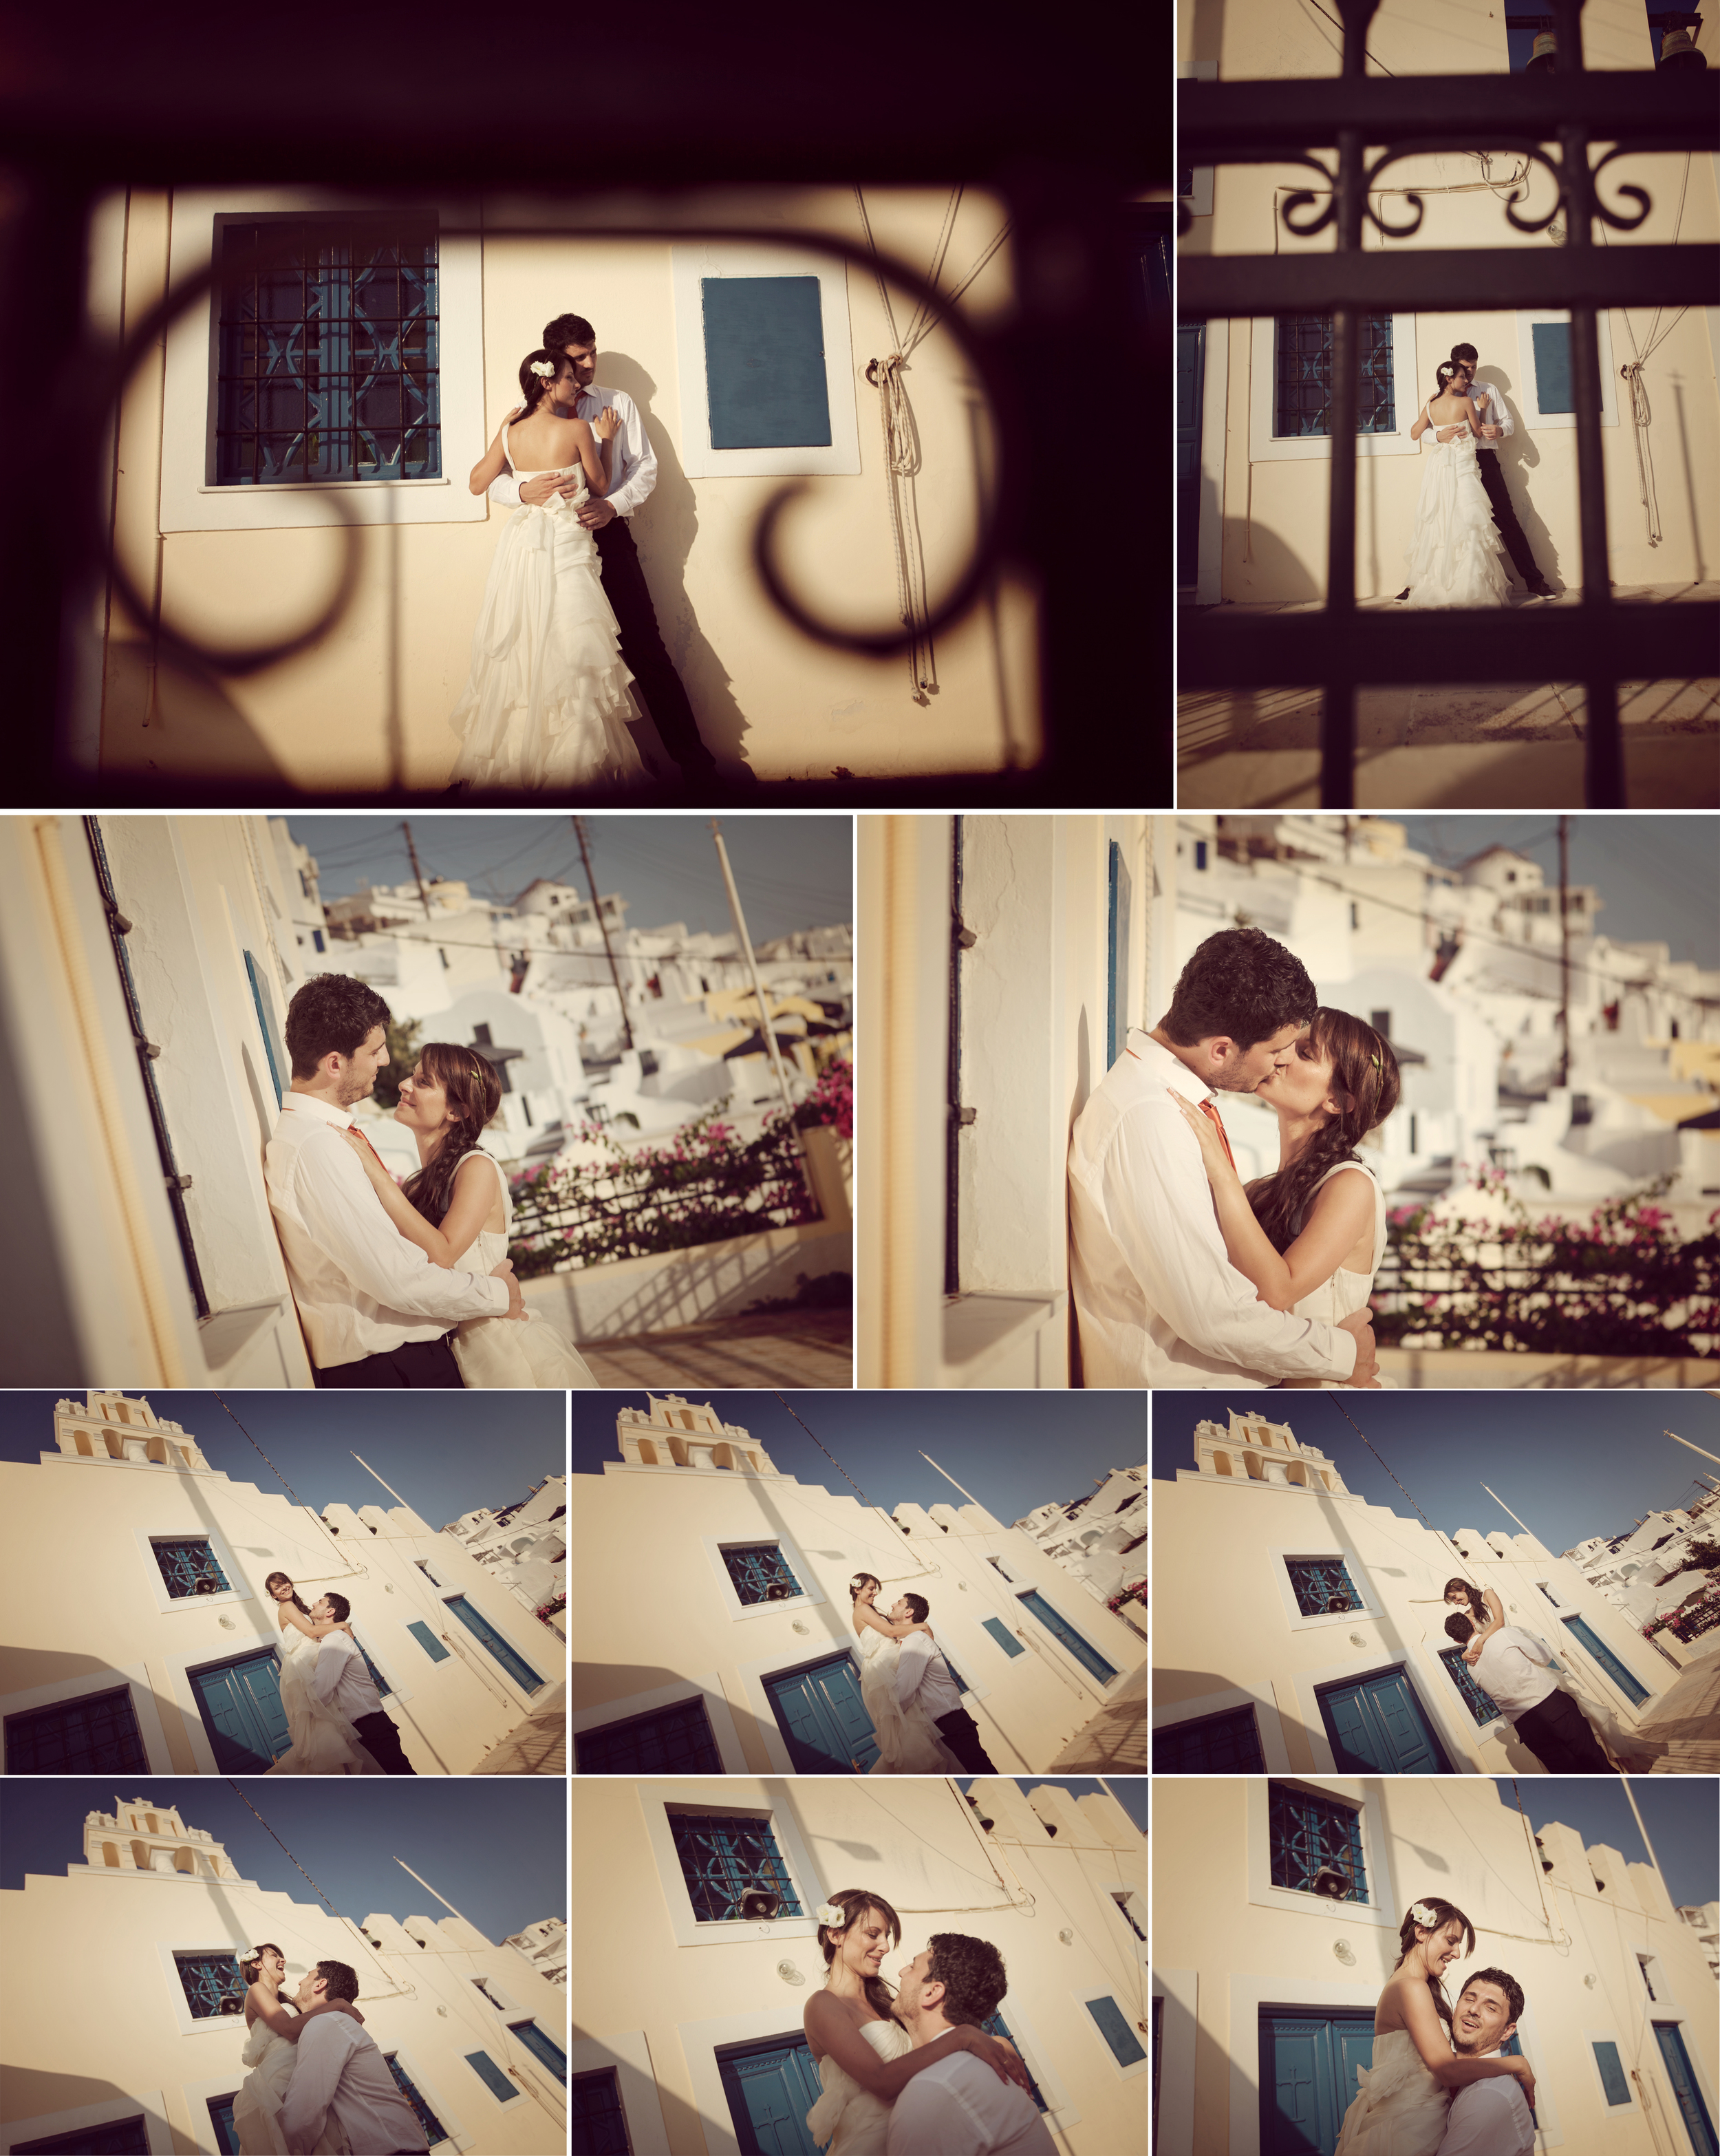 ANDRIOPOULOS WEDDINGS SANTORINI 06.jpg